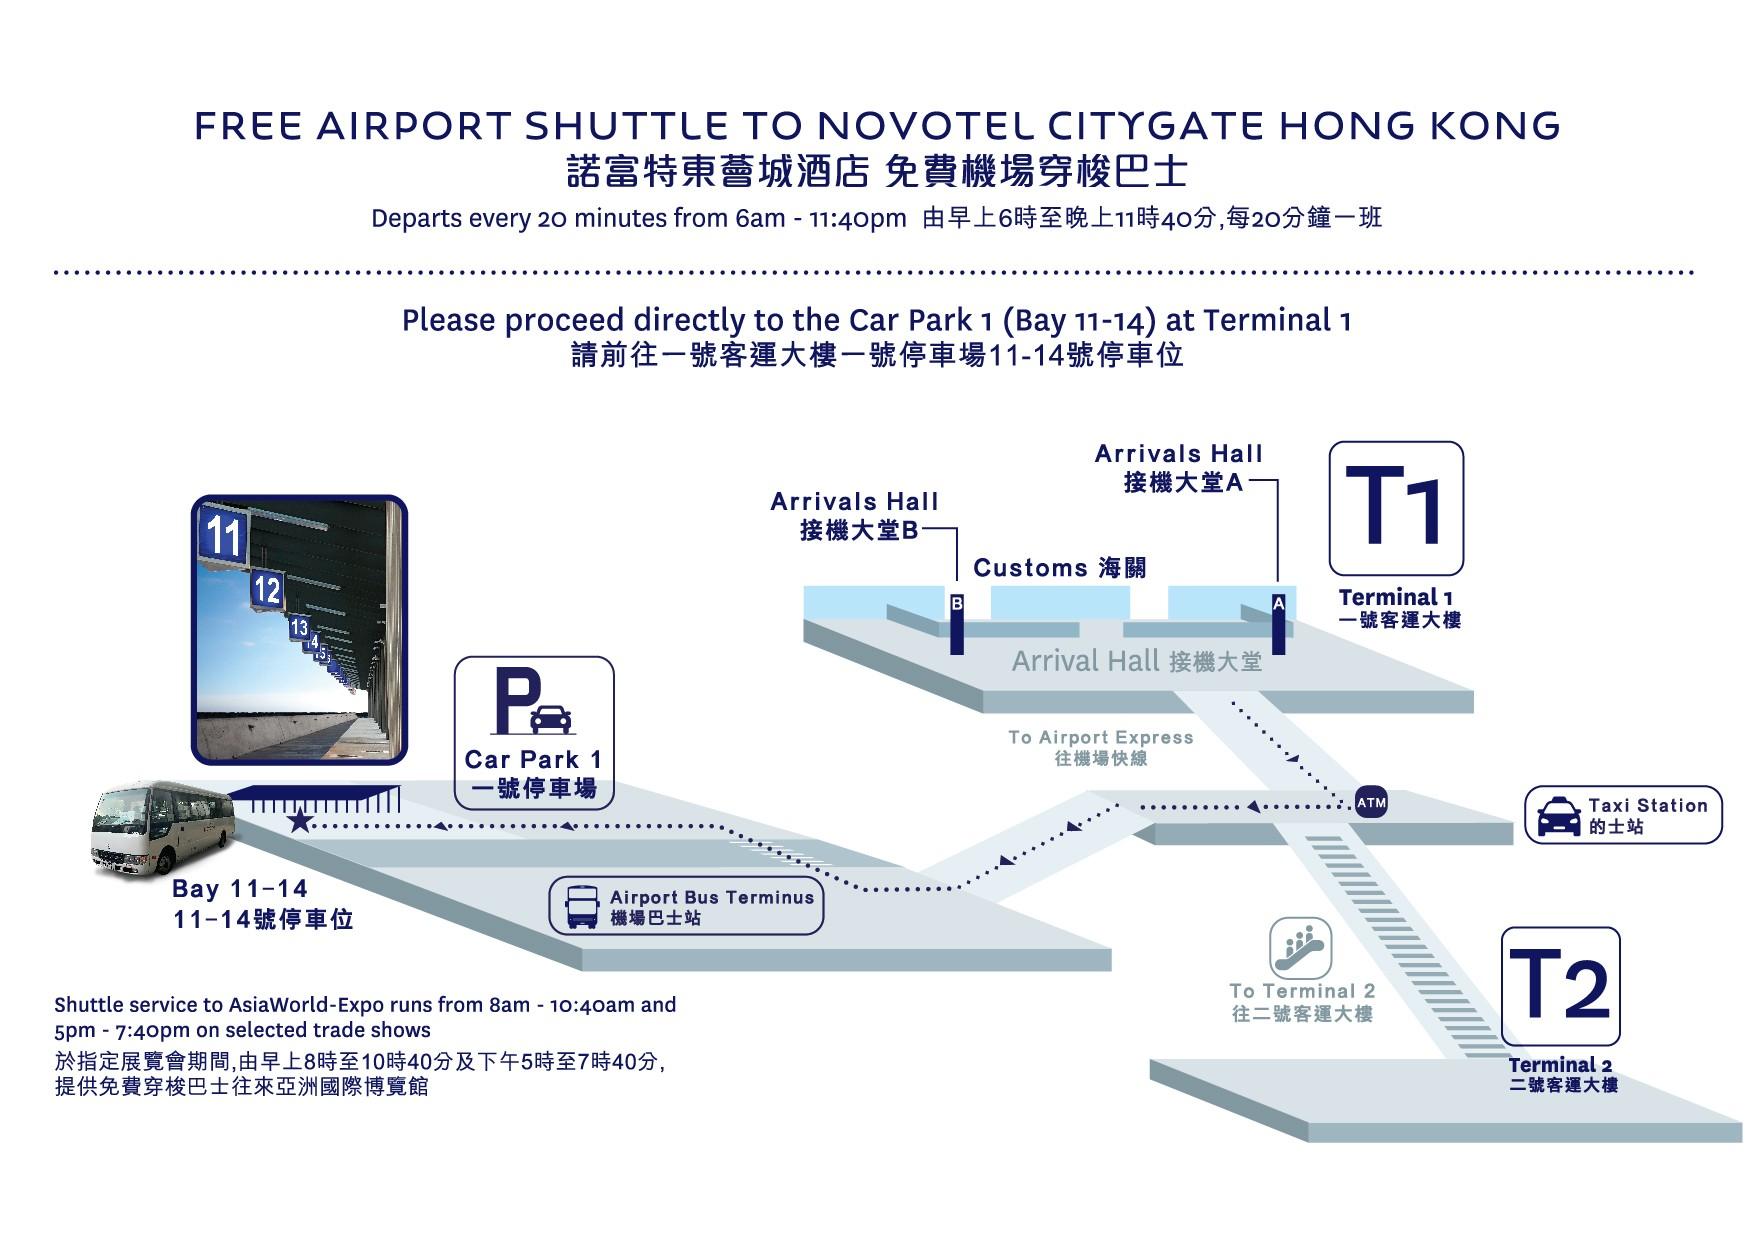 Free Airport Shuttle to Novotel Citygate Hong Kong